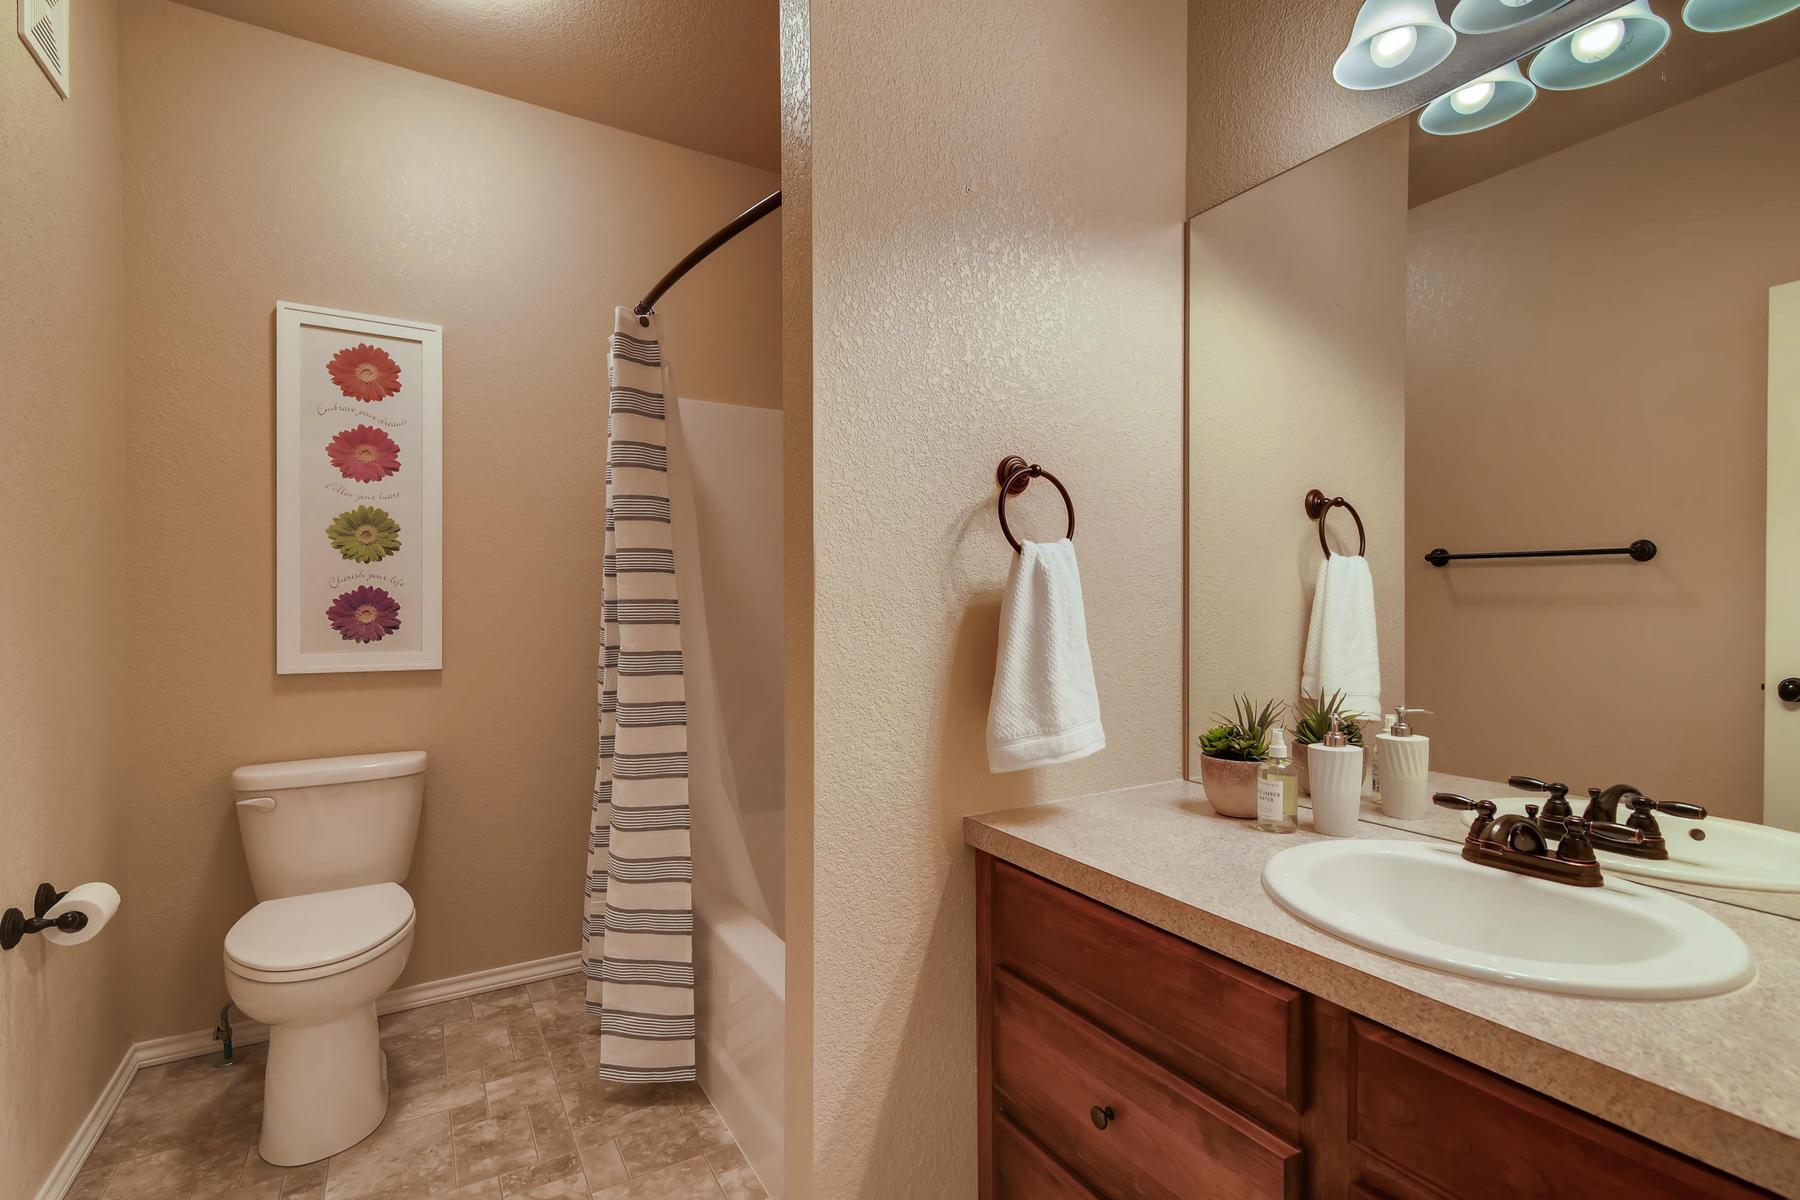 6915 W 3rd St Unit D1414-021-018-Bathroom-MLS_Size.jpg